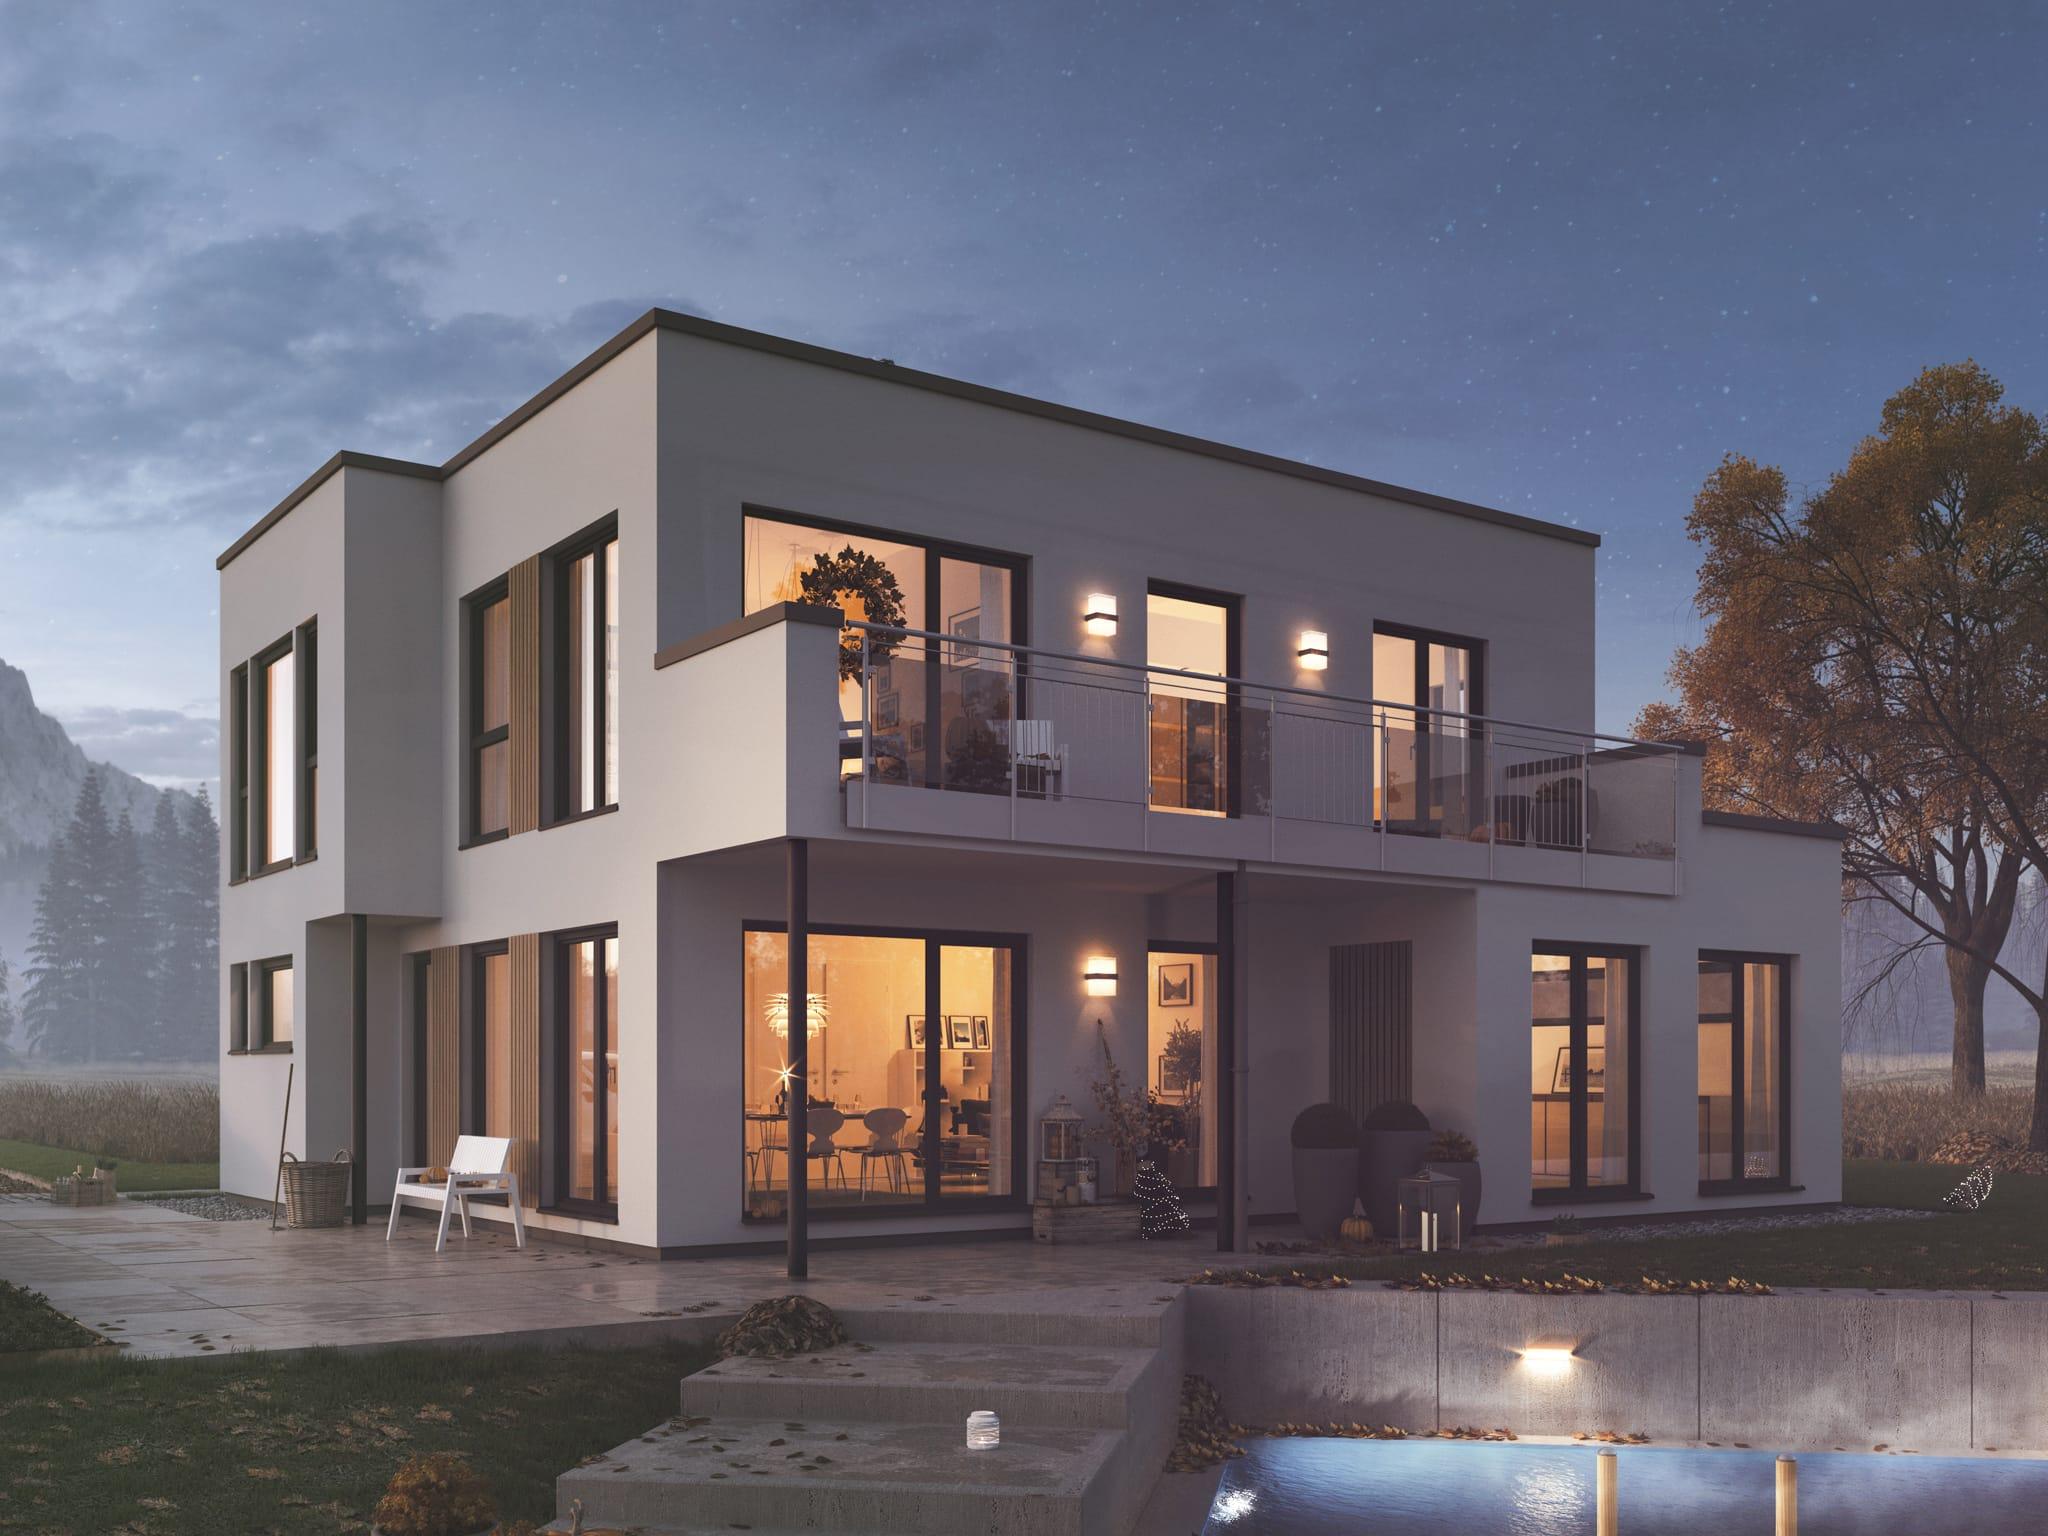 Einfamilienhaus Erker Balkon Flachdach EVOLUTION 152 V2 Herbst Abend Bien Zenker Fertighaus